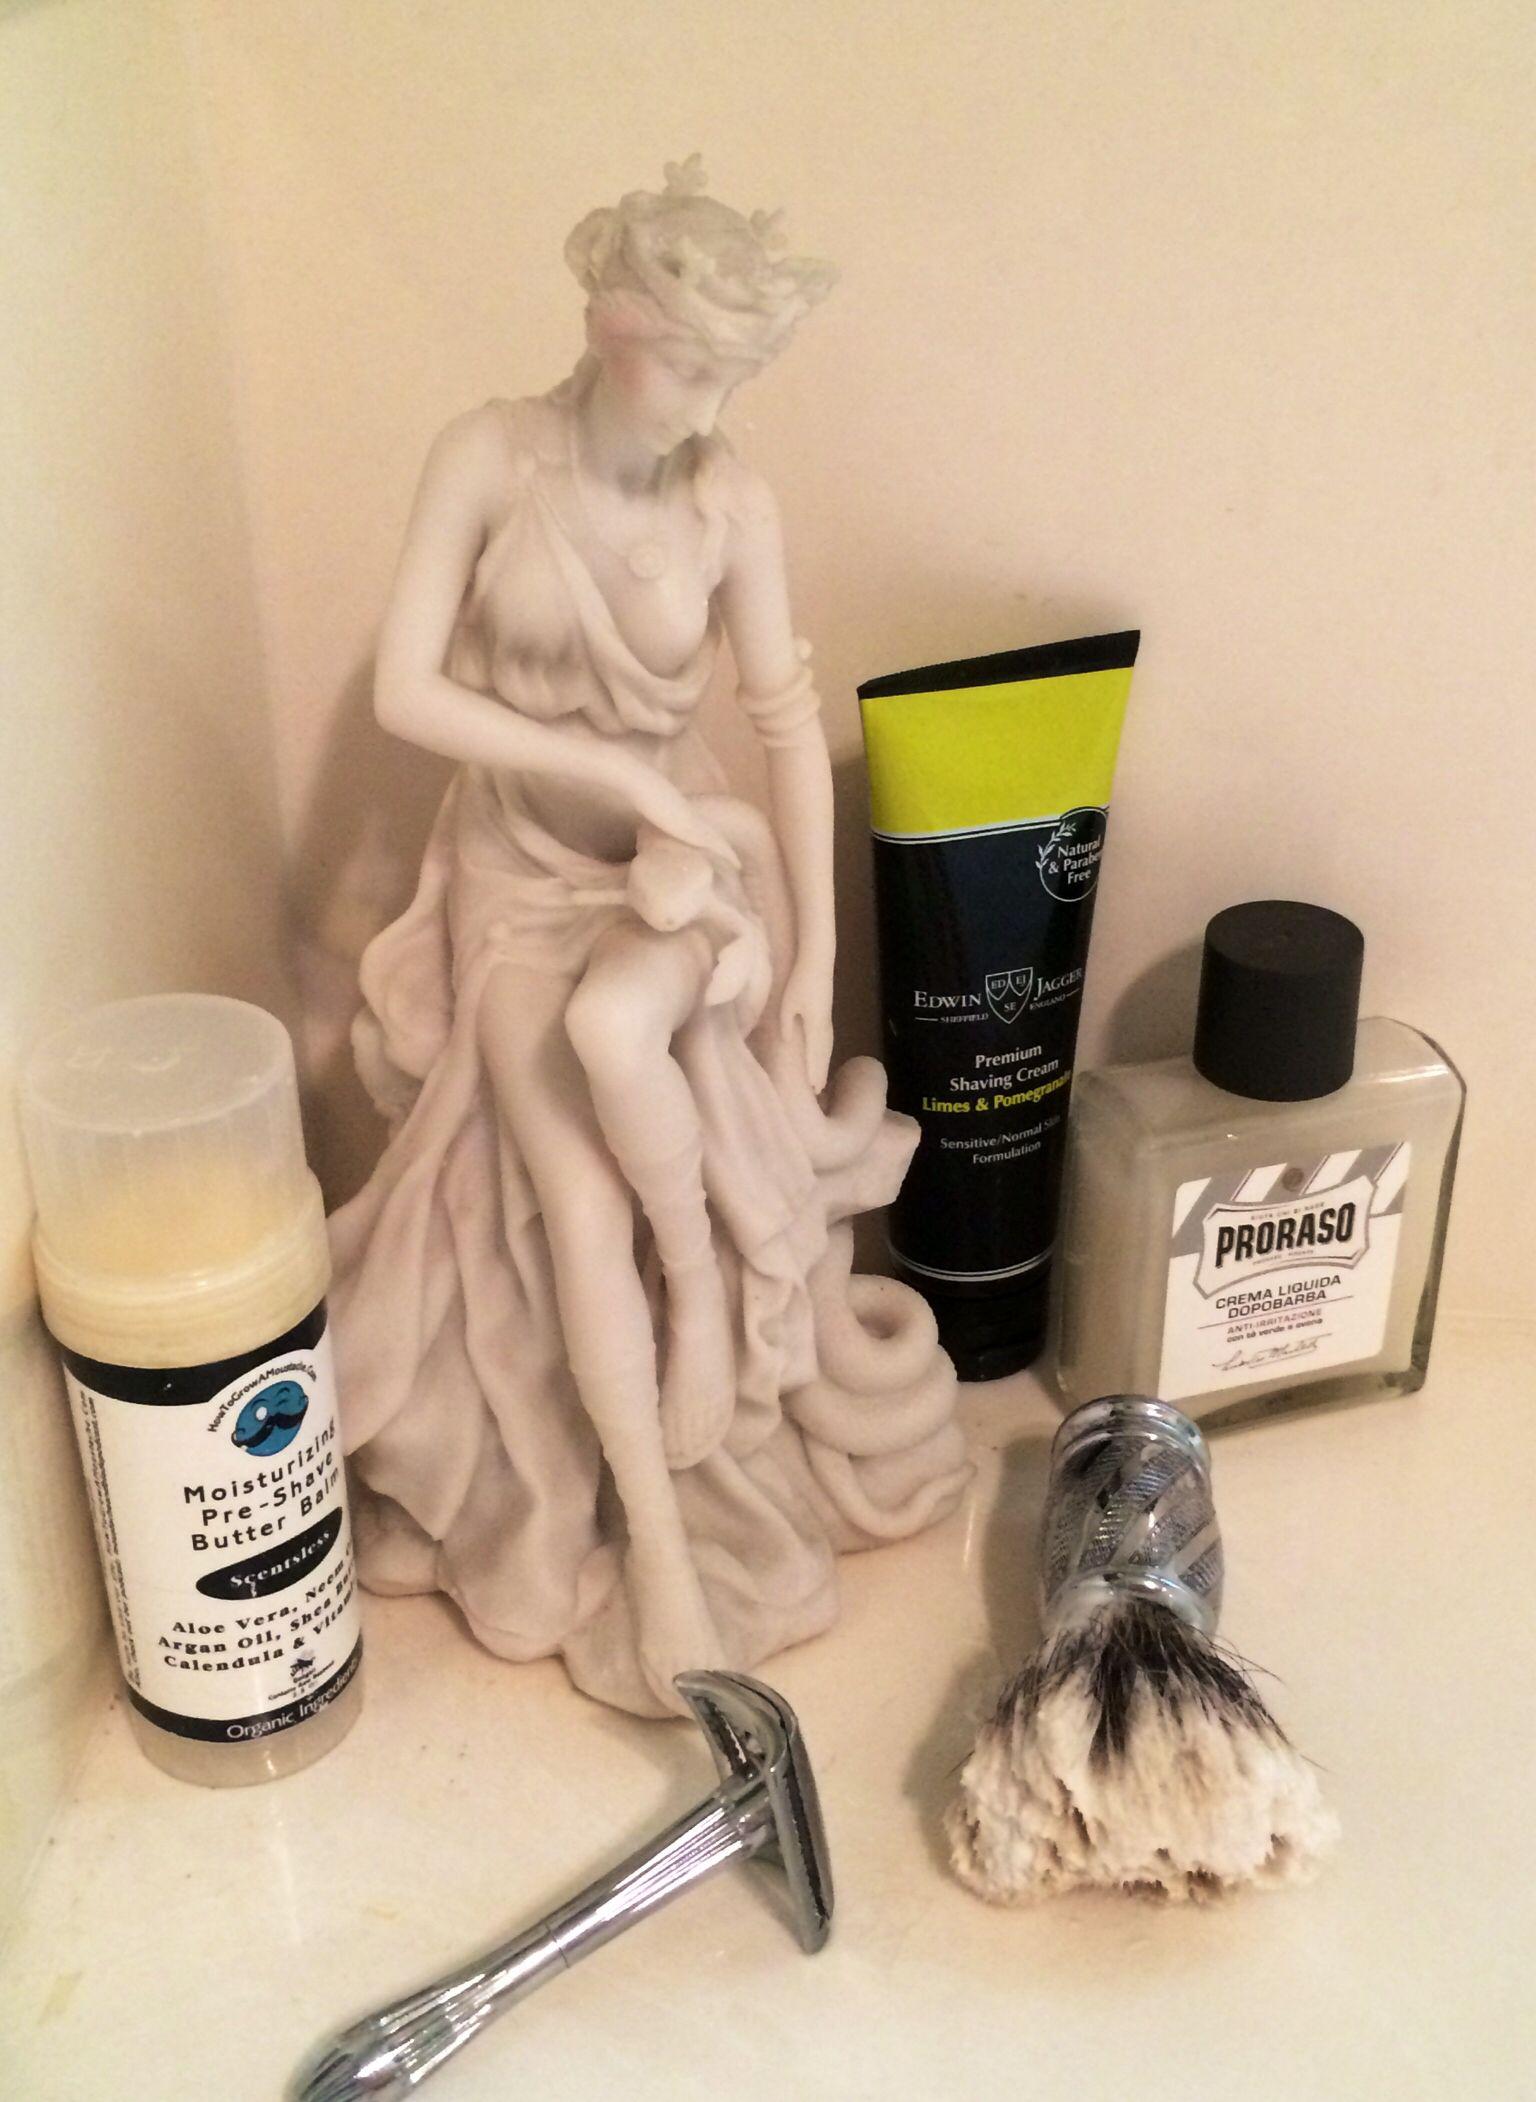 SOTD - Lady Pomco Slant, Astra green blades, BossRazors re-knotted brush, Proraso white balm & Edwin Jagger Limes & Pom shaving soap.